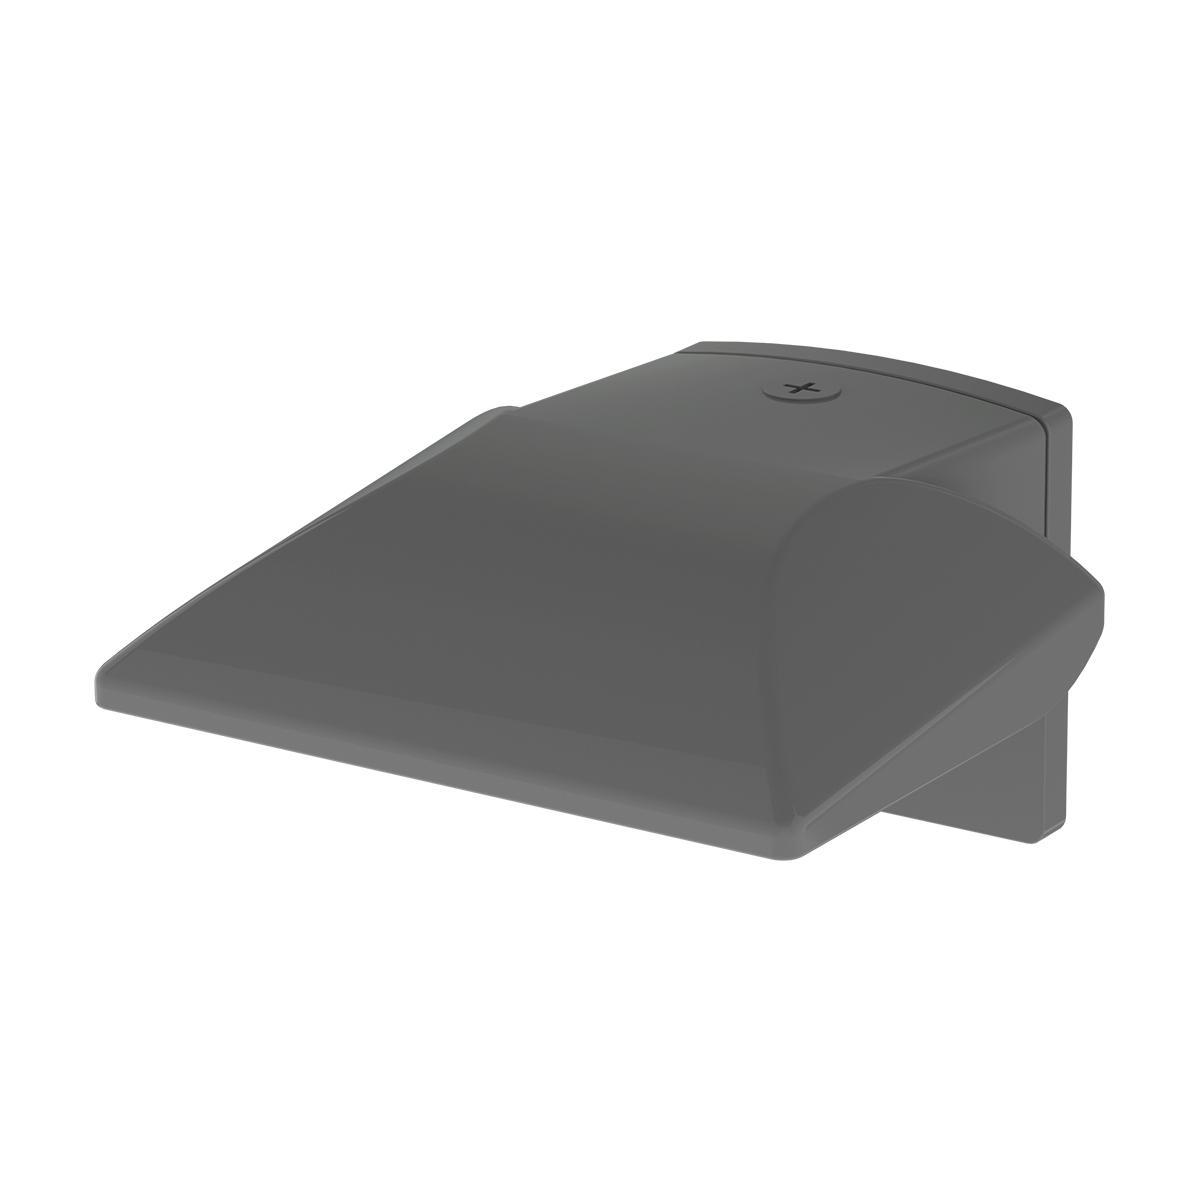 WP-LED219-30-AGH WAC LTG ENDURANCE HAWK WALL PACK 19W 3000K